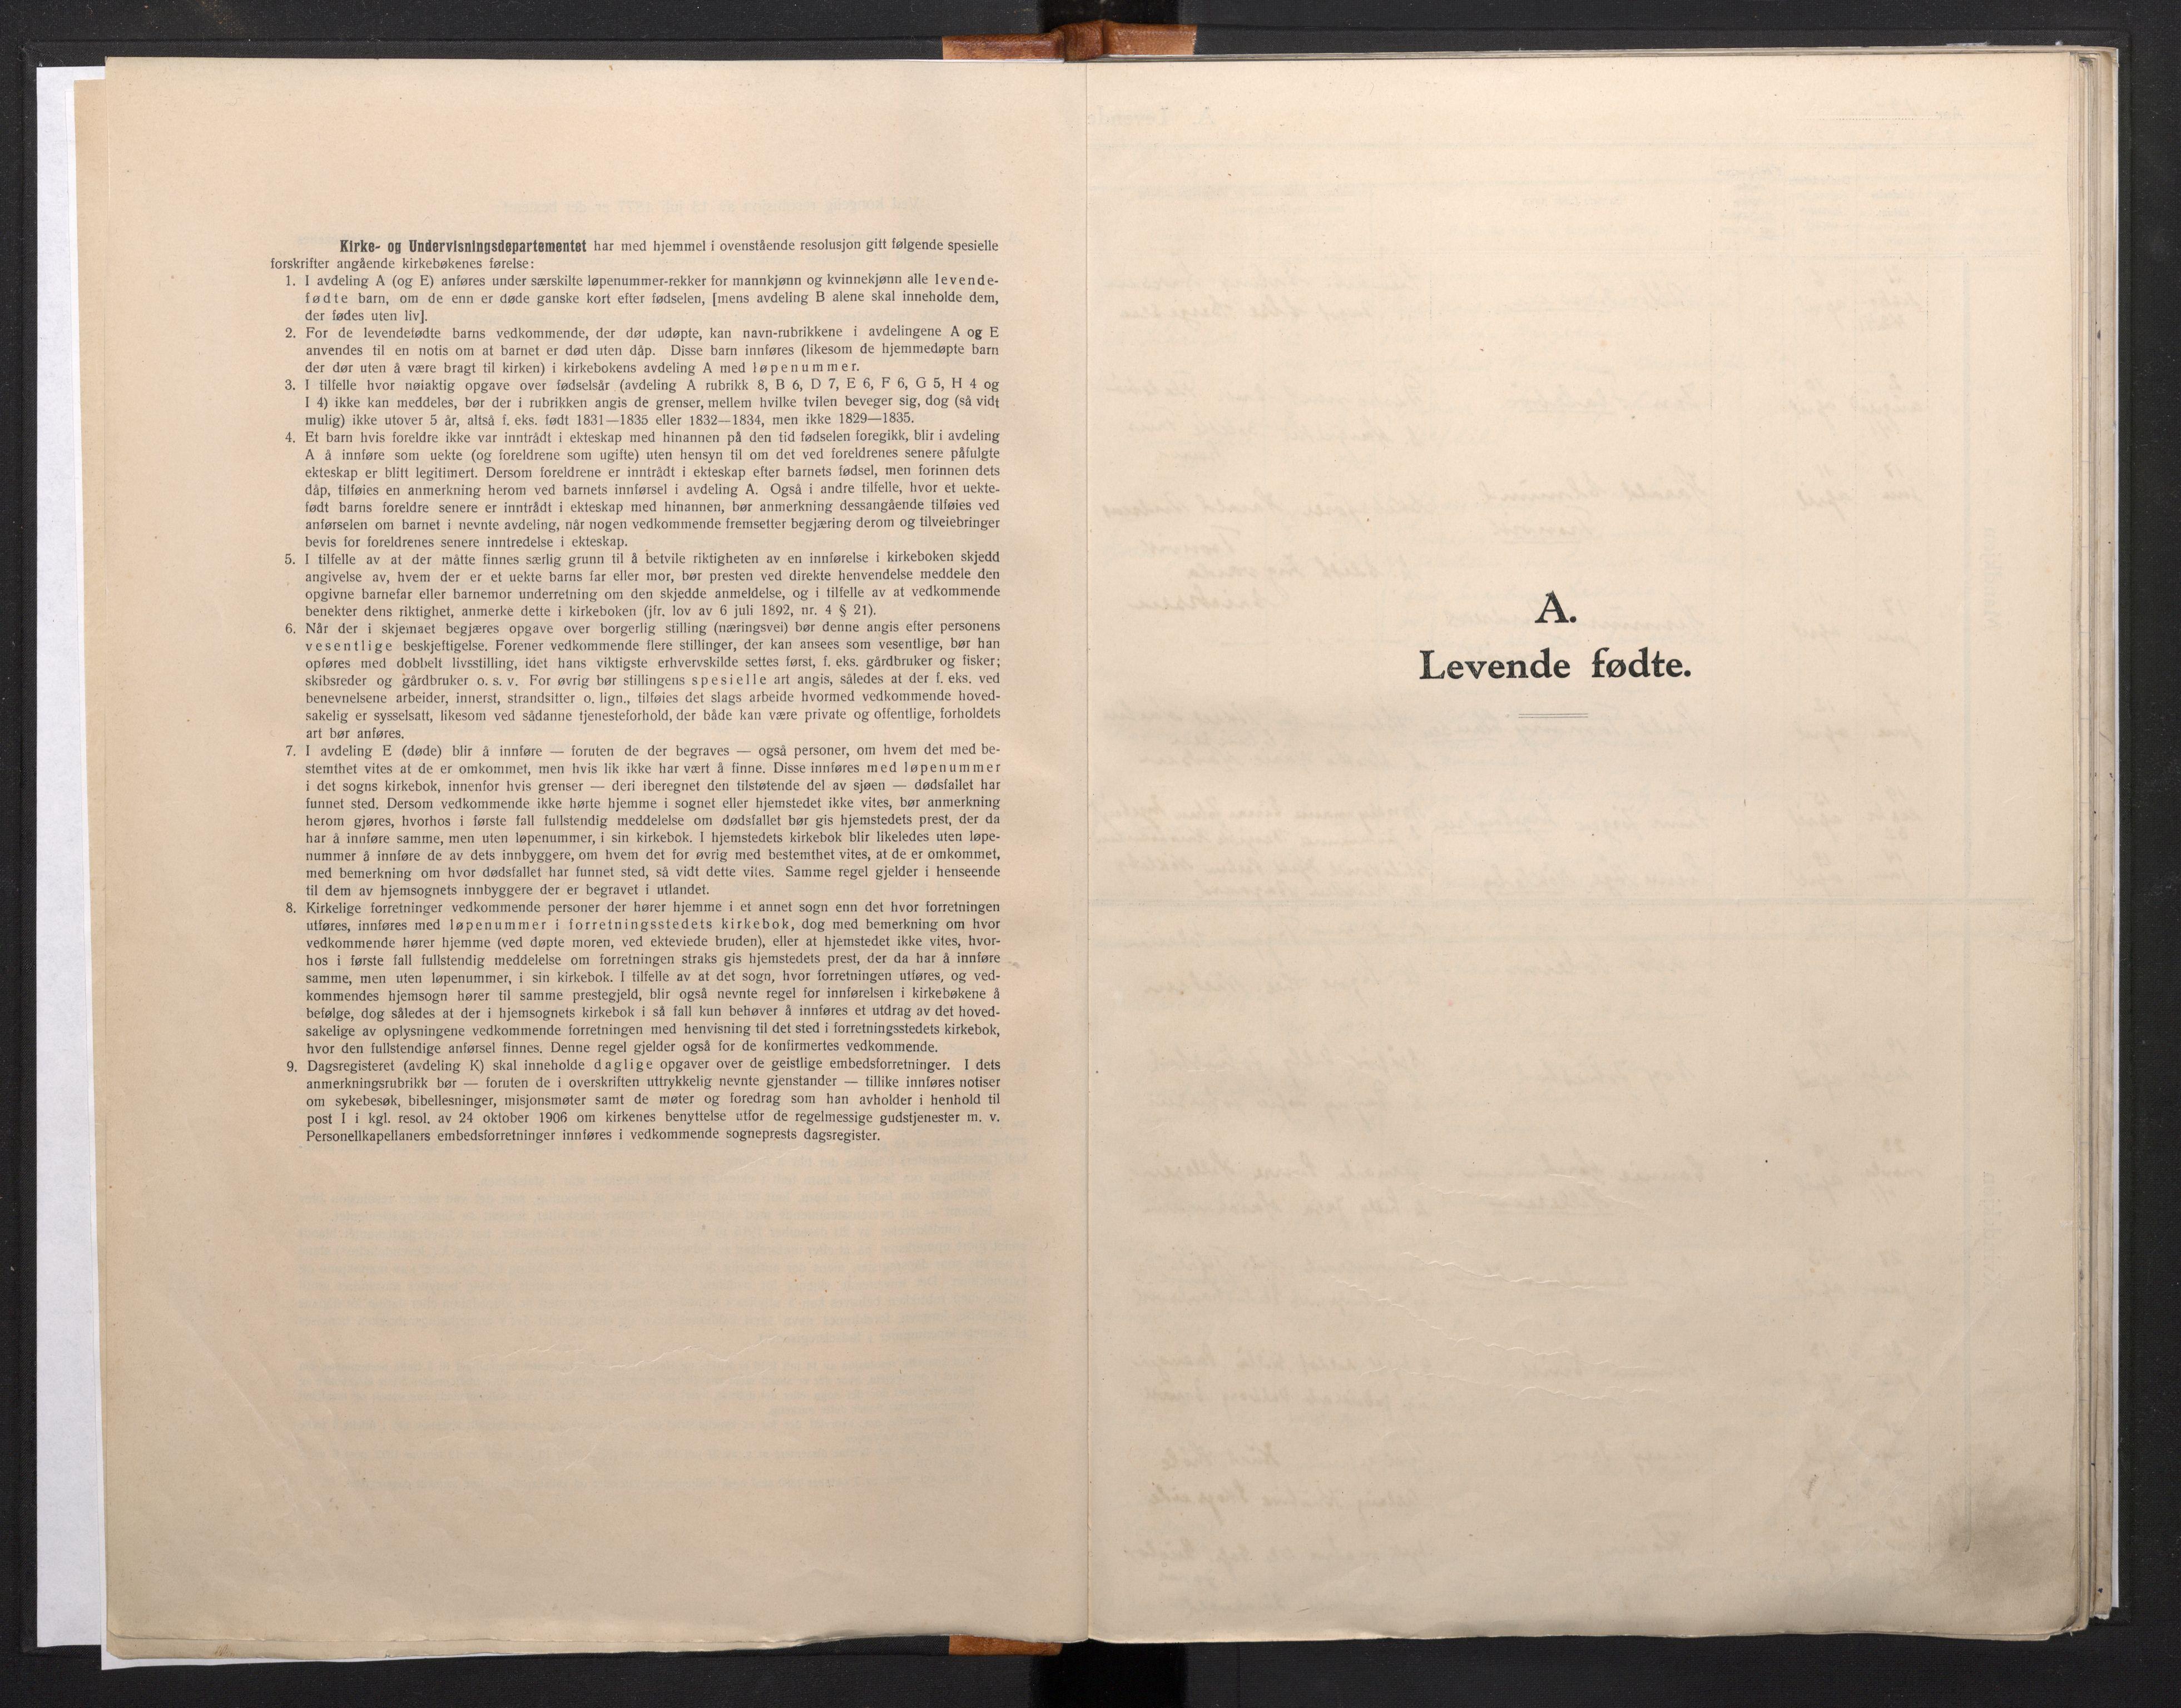 SAB, Domkirken Sokneprestembete, H/Haa/L0016: Ministerialbok nr. A 15, 1942-1952